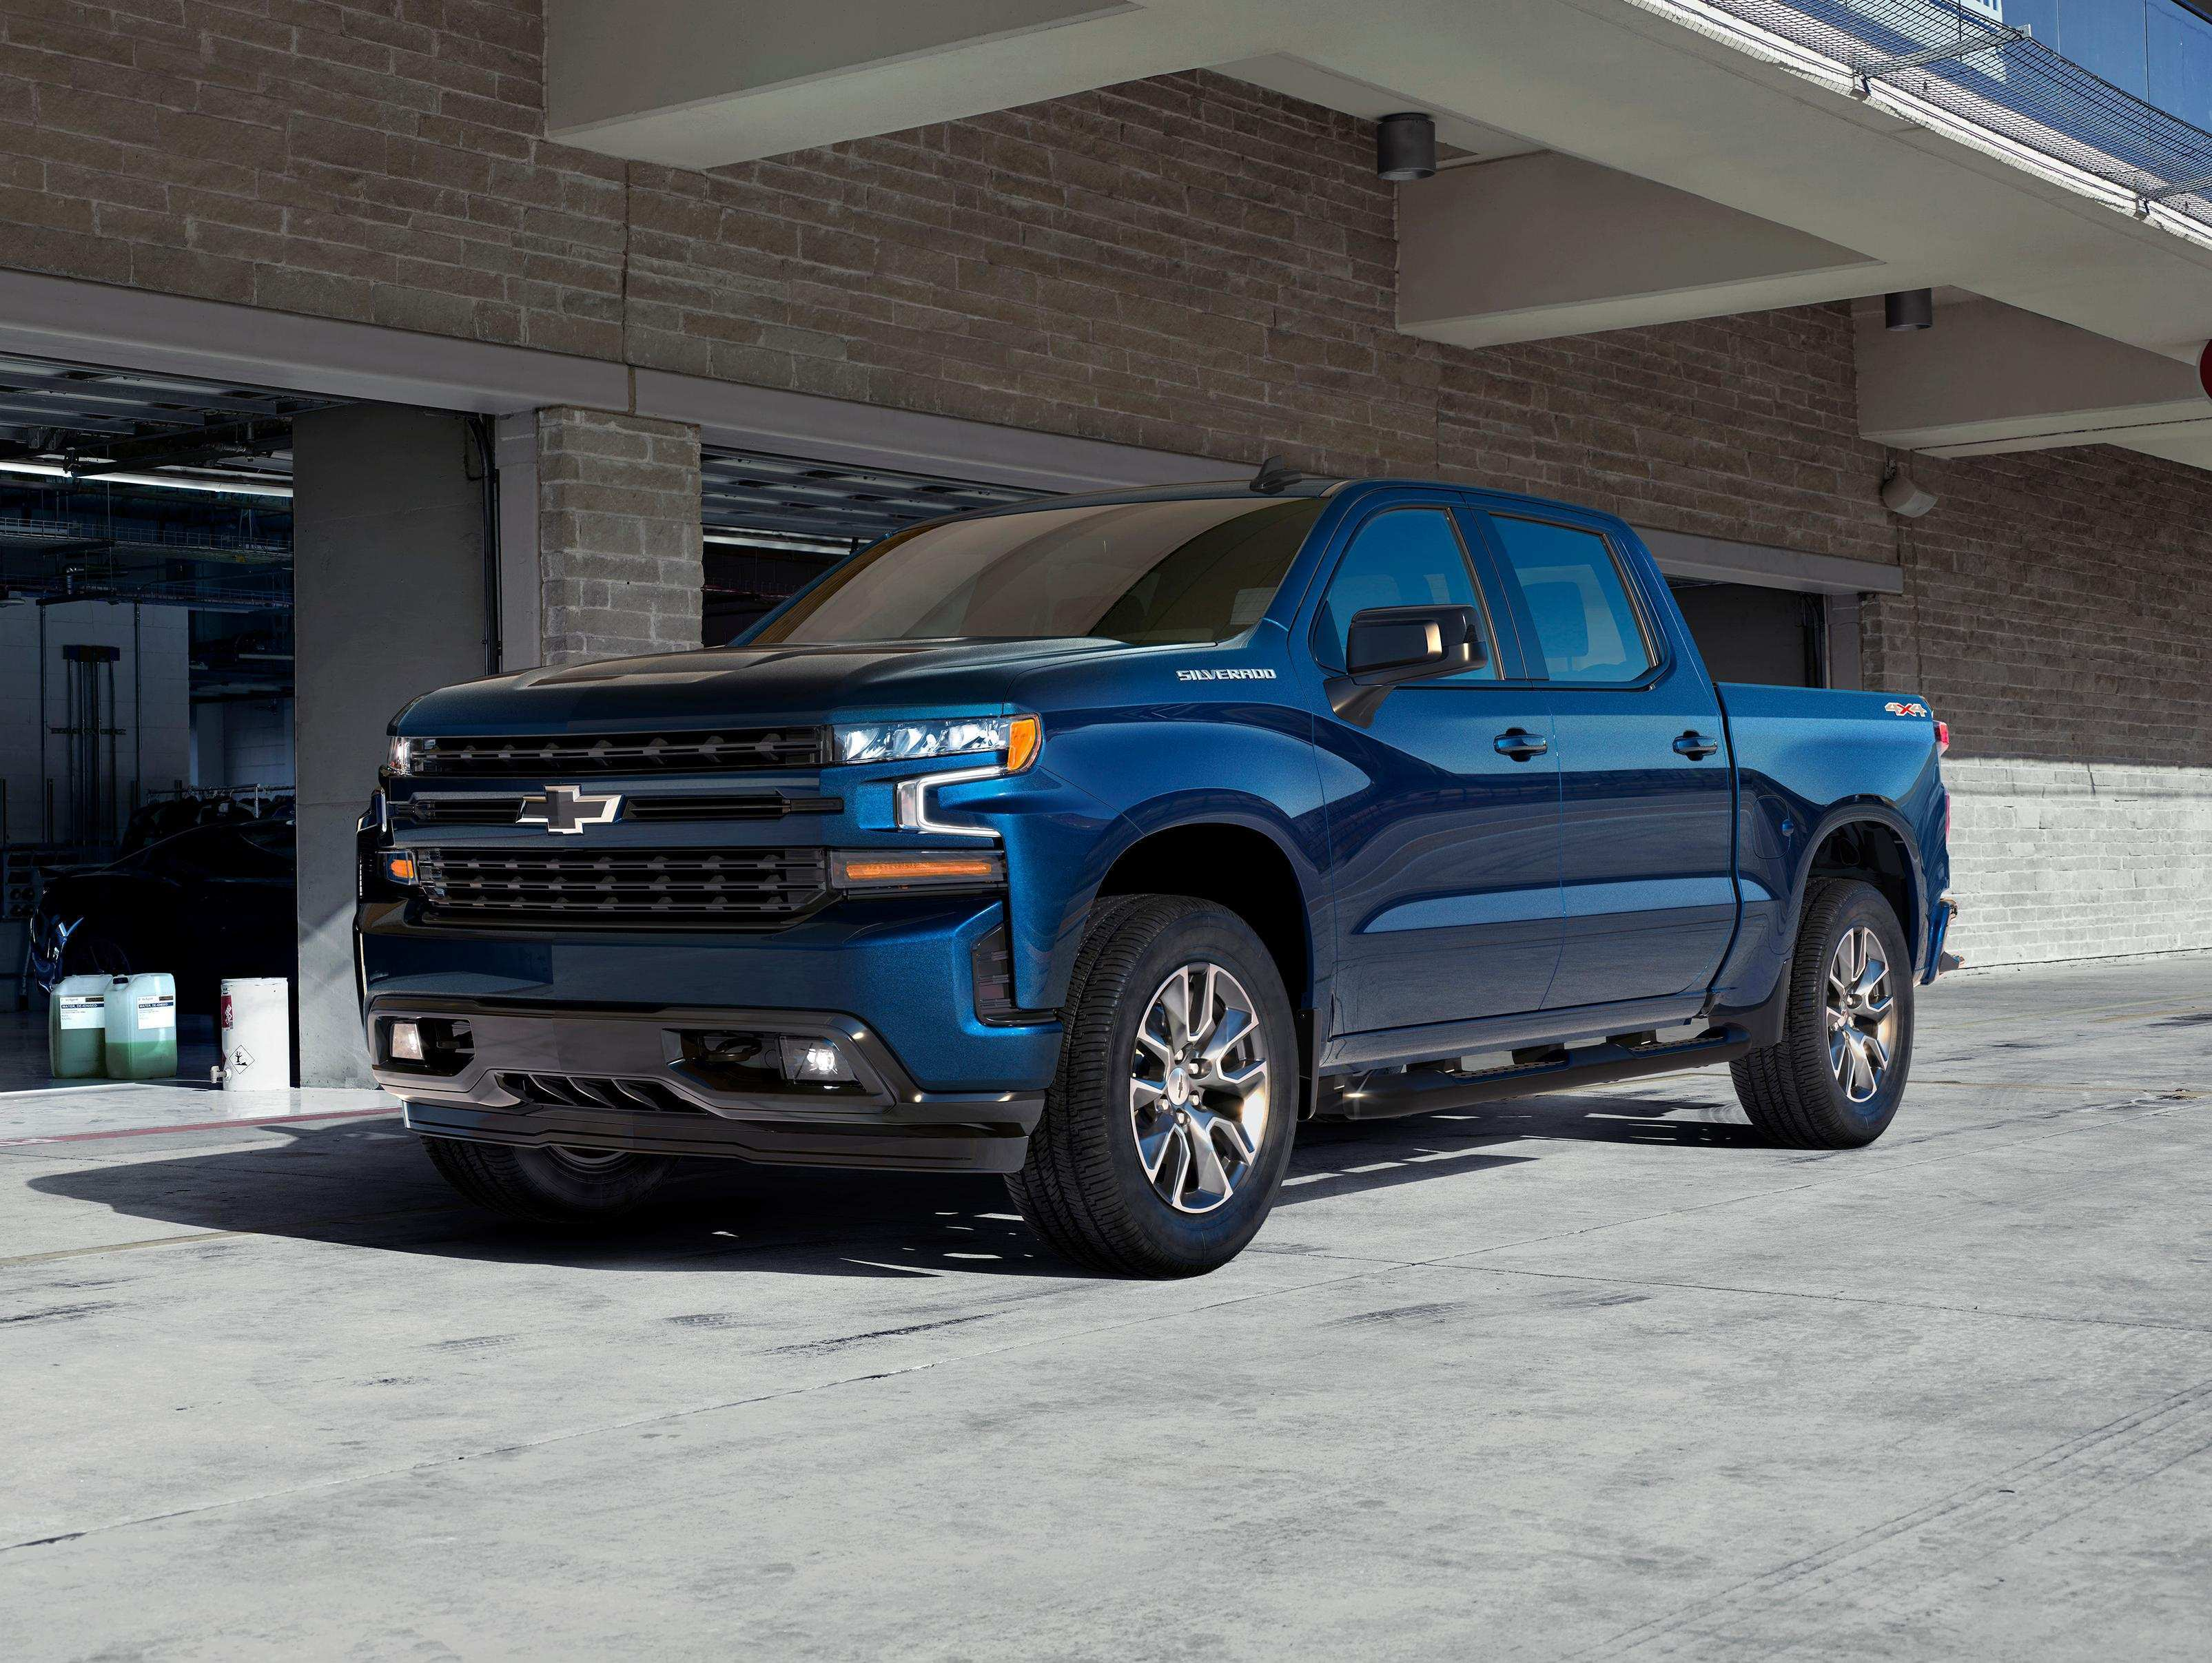 58 The New Nueva Chevrolet 2019 Release Date Interior with New Nueva Chevrolet 2019 Release Date